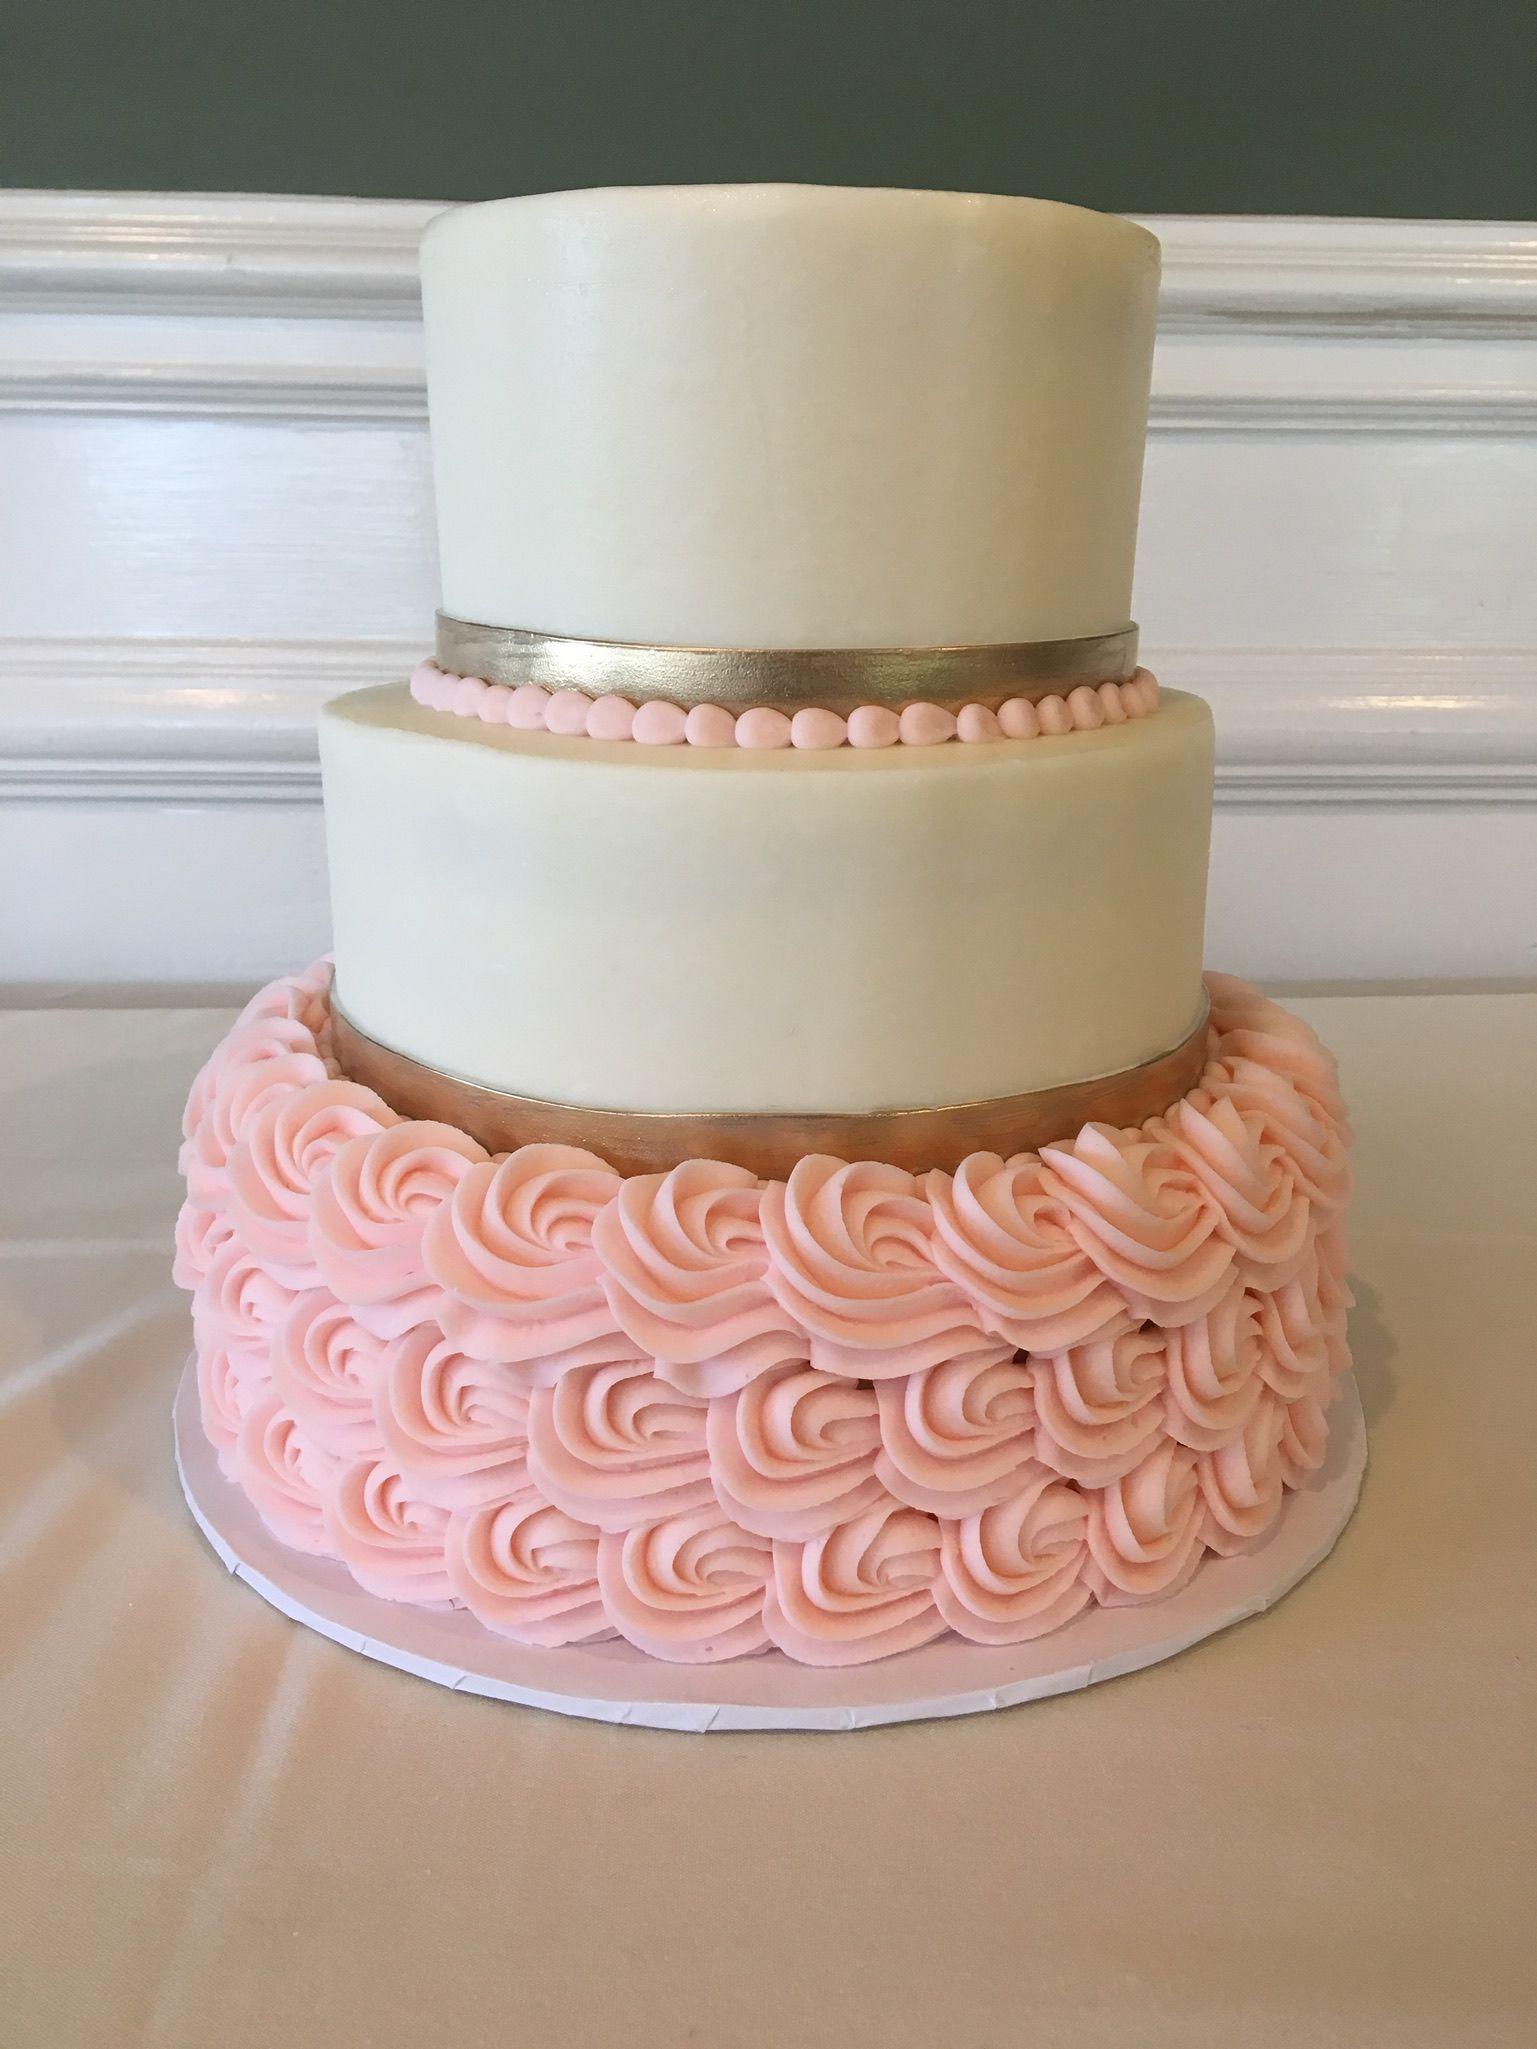 Wedding Cakes Cincinnati Cake 3 Tier Wedding Cakes Wedding Cakes